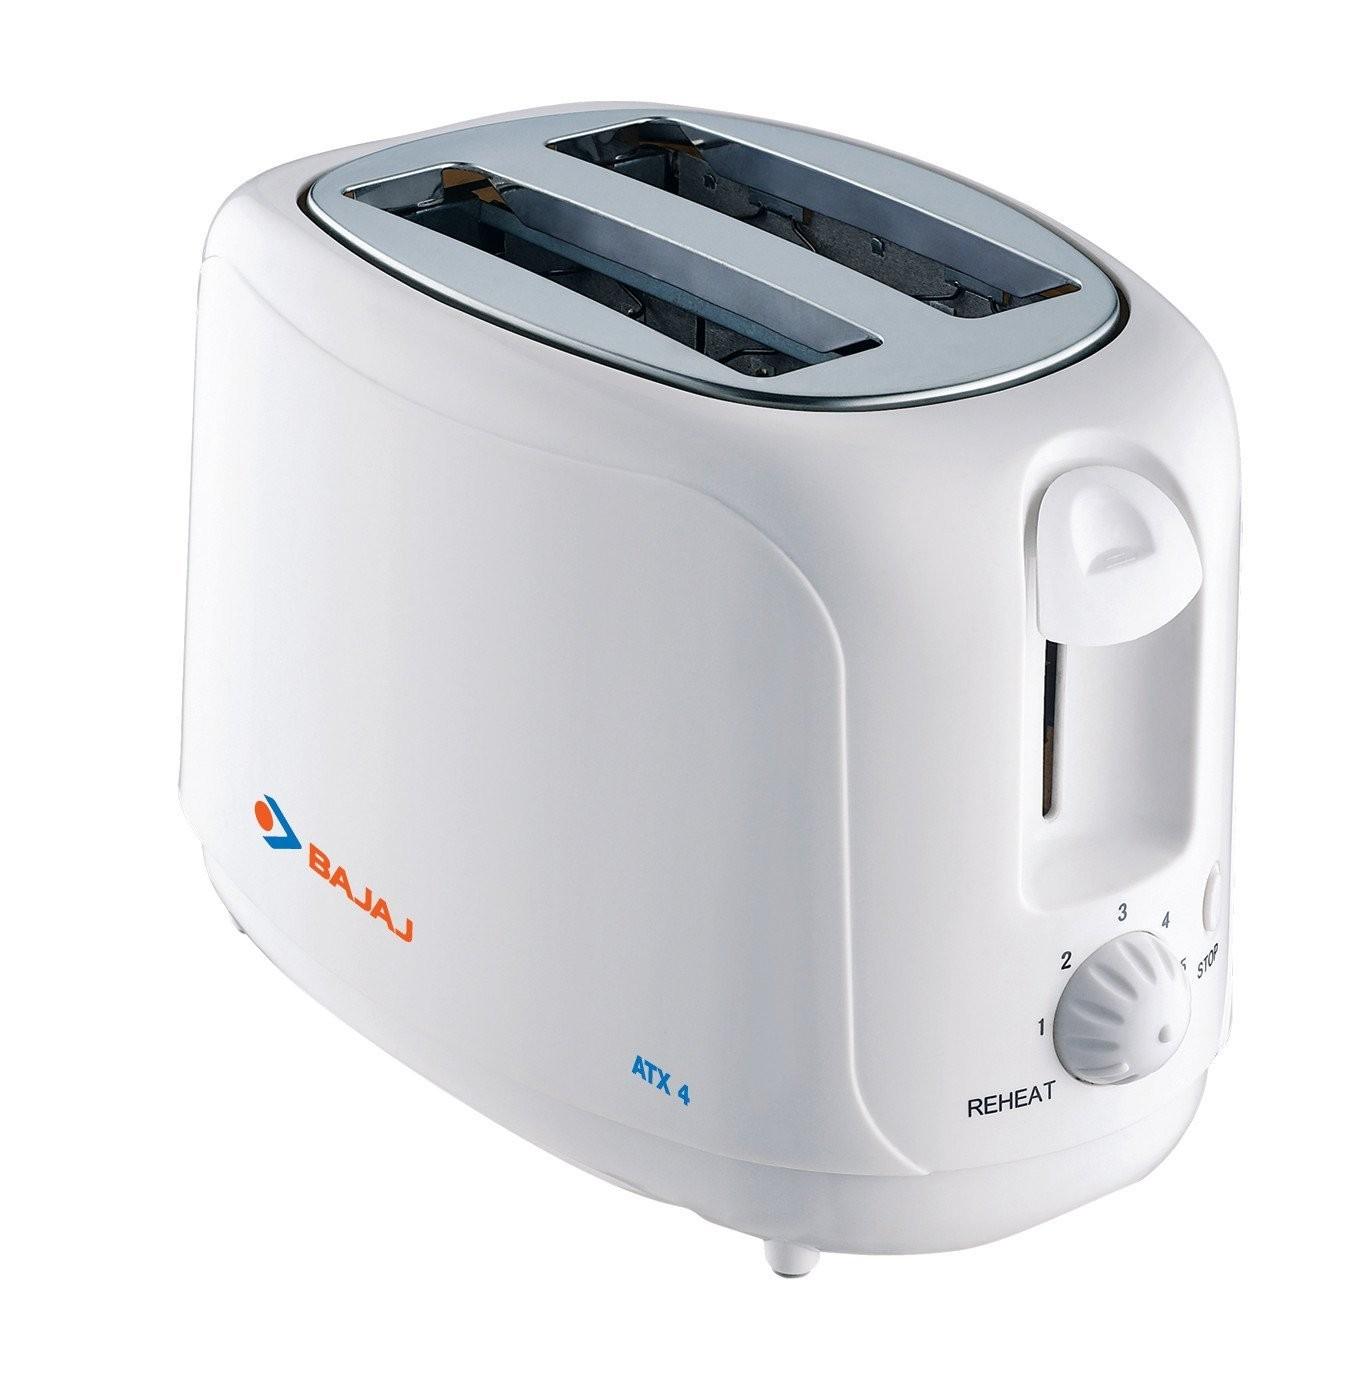 Bajaj Toaster ATX 4